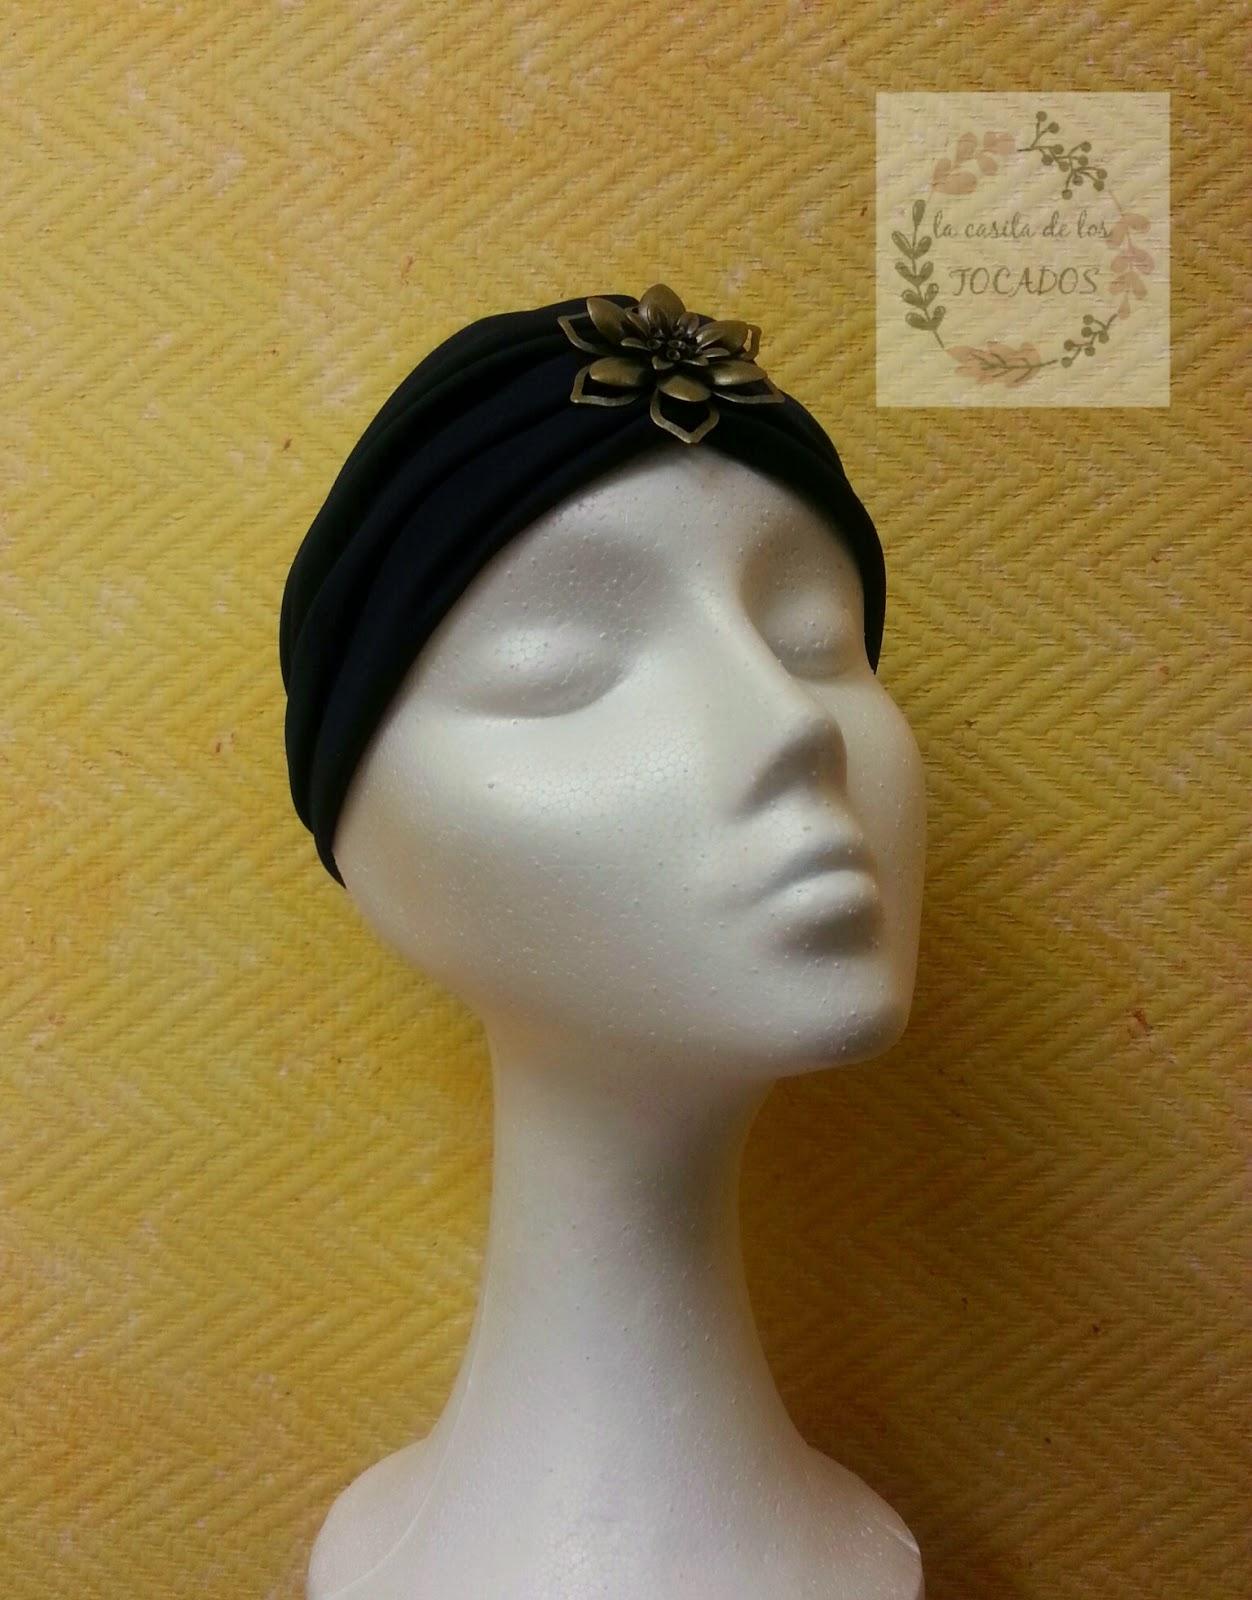 turbante para boda, sencillo en color azul marino con aplicación de latón con forma de flor, discreto y artesanal